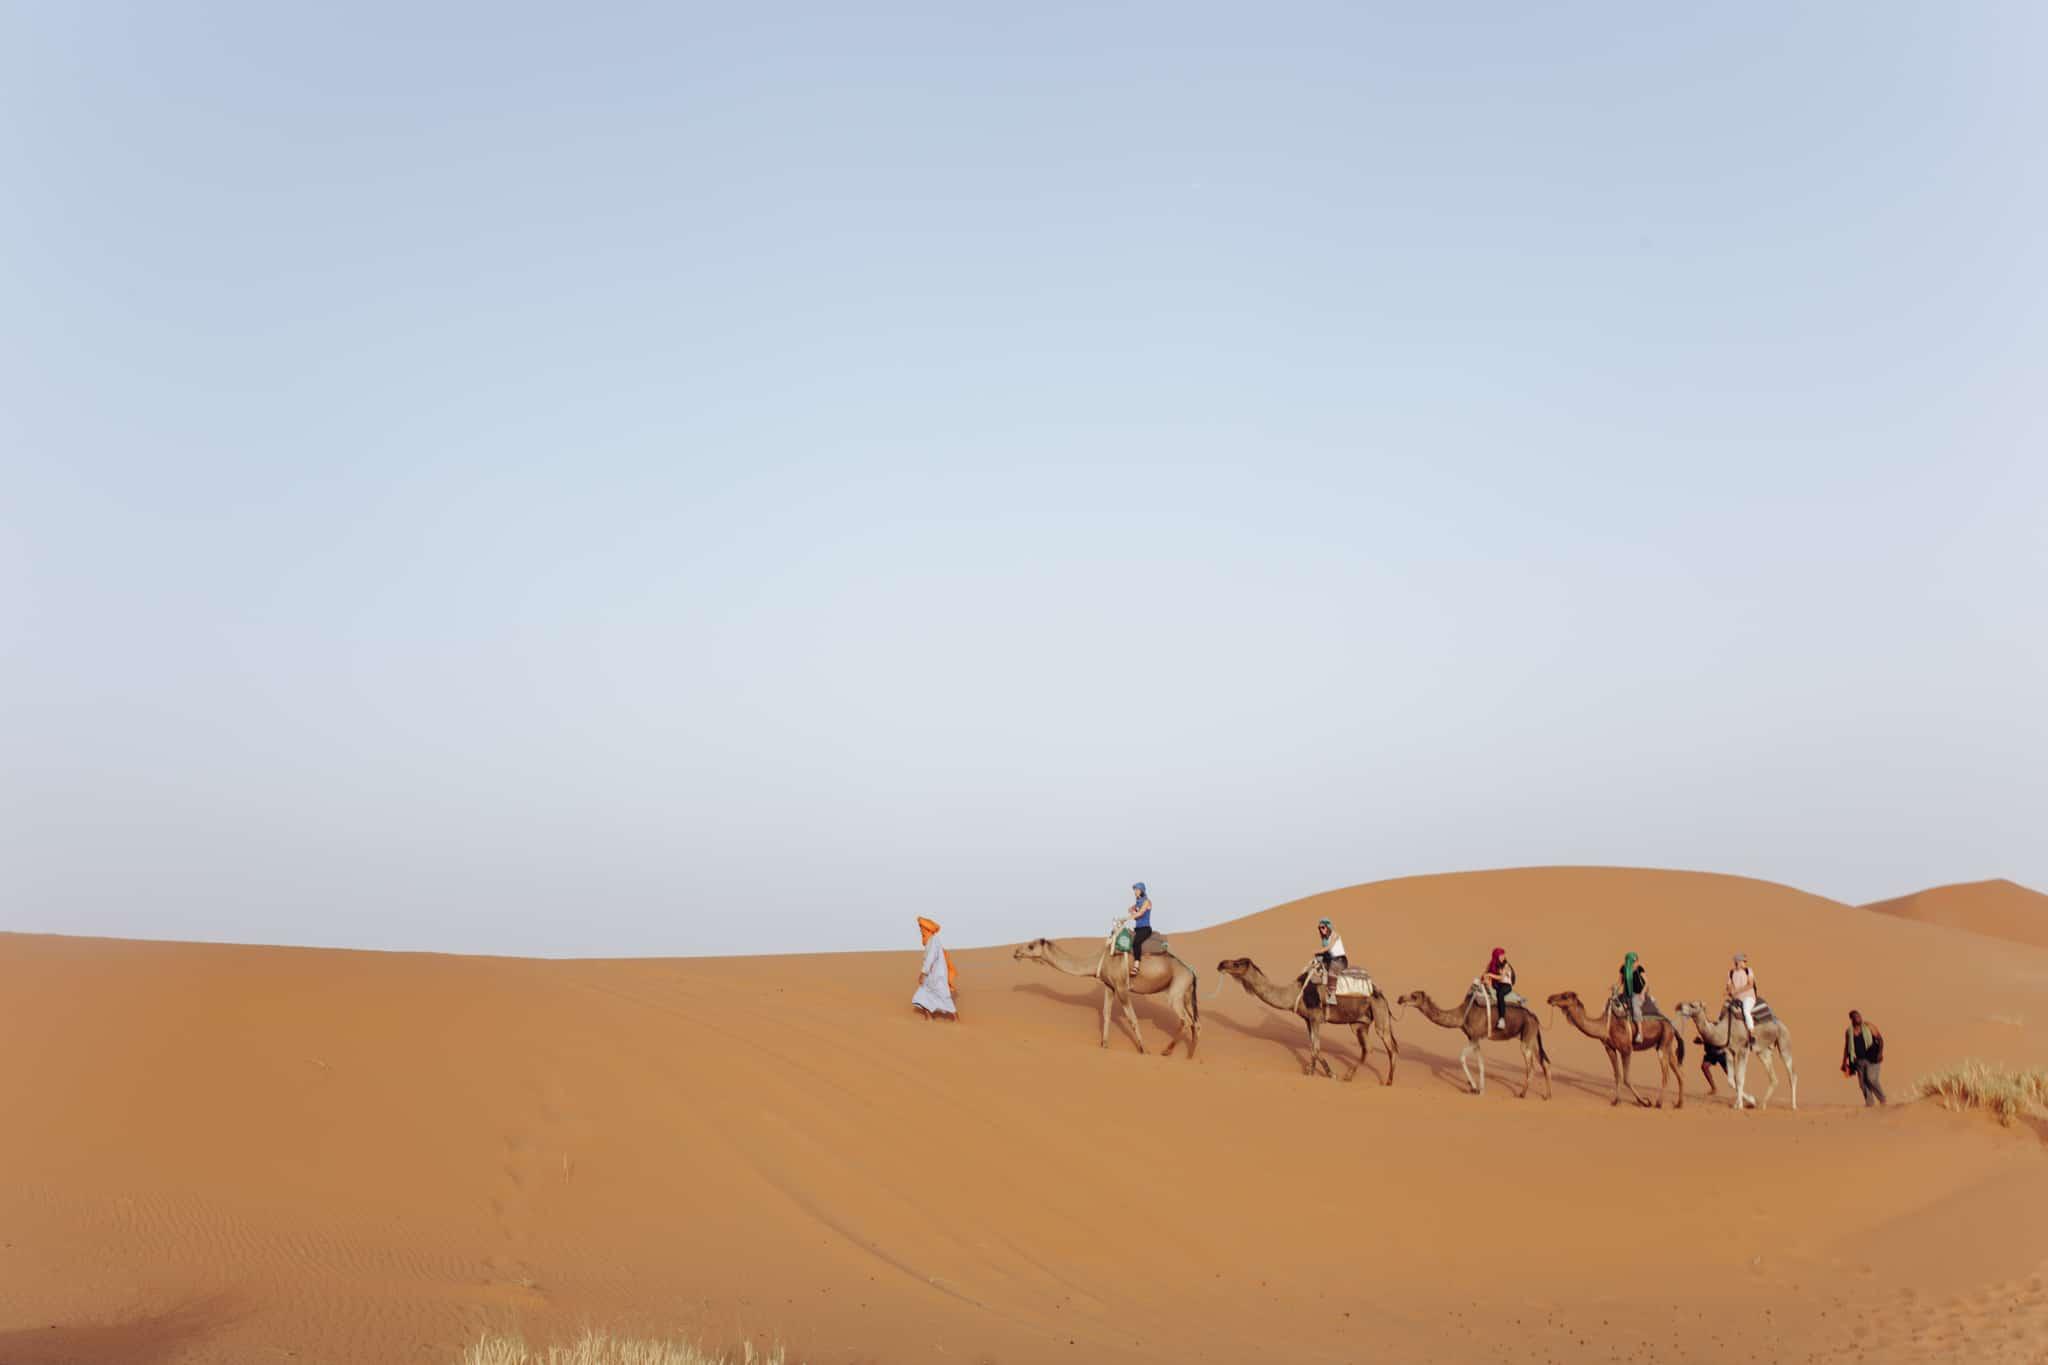 Camel train at Erg Chebbi